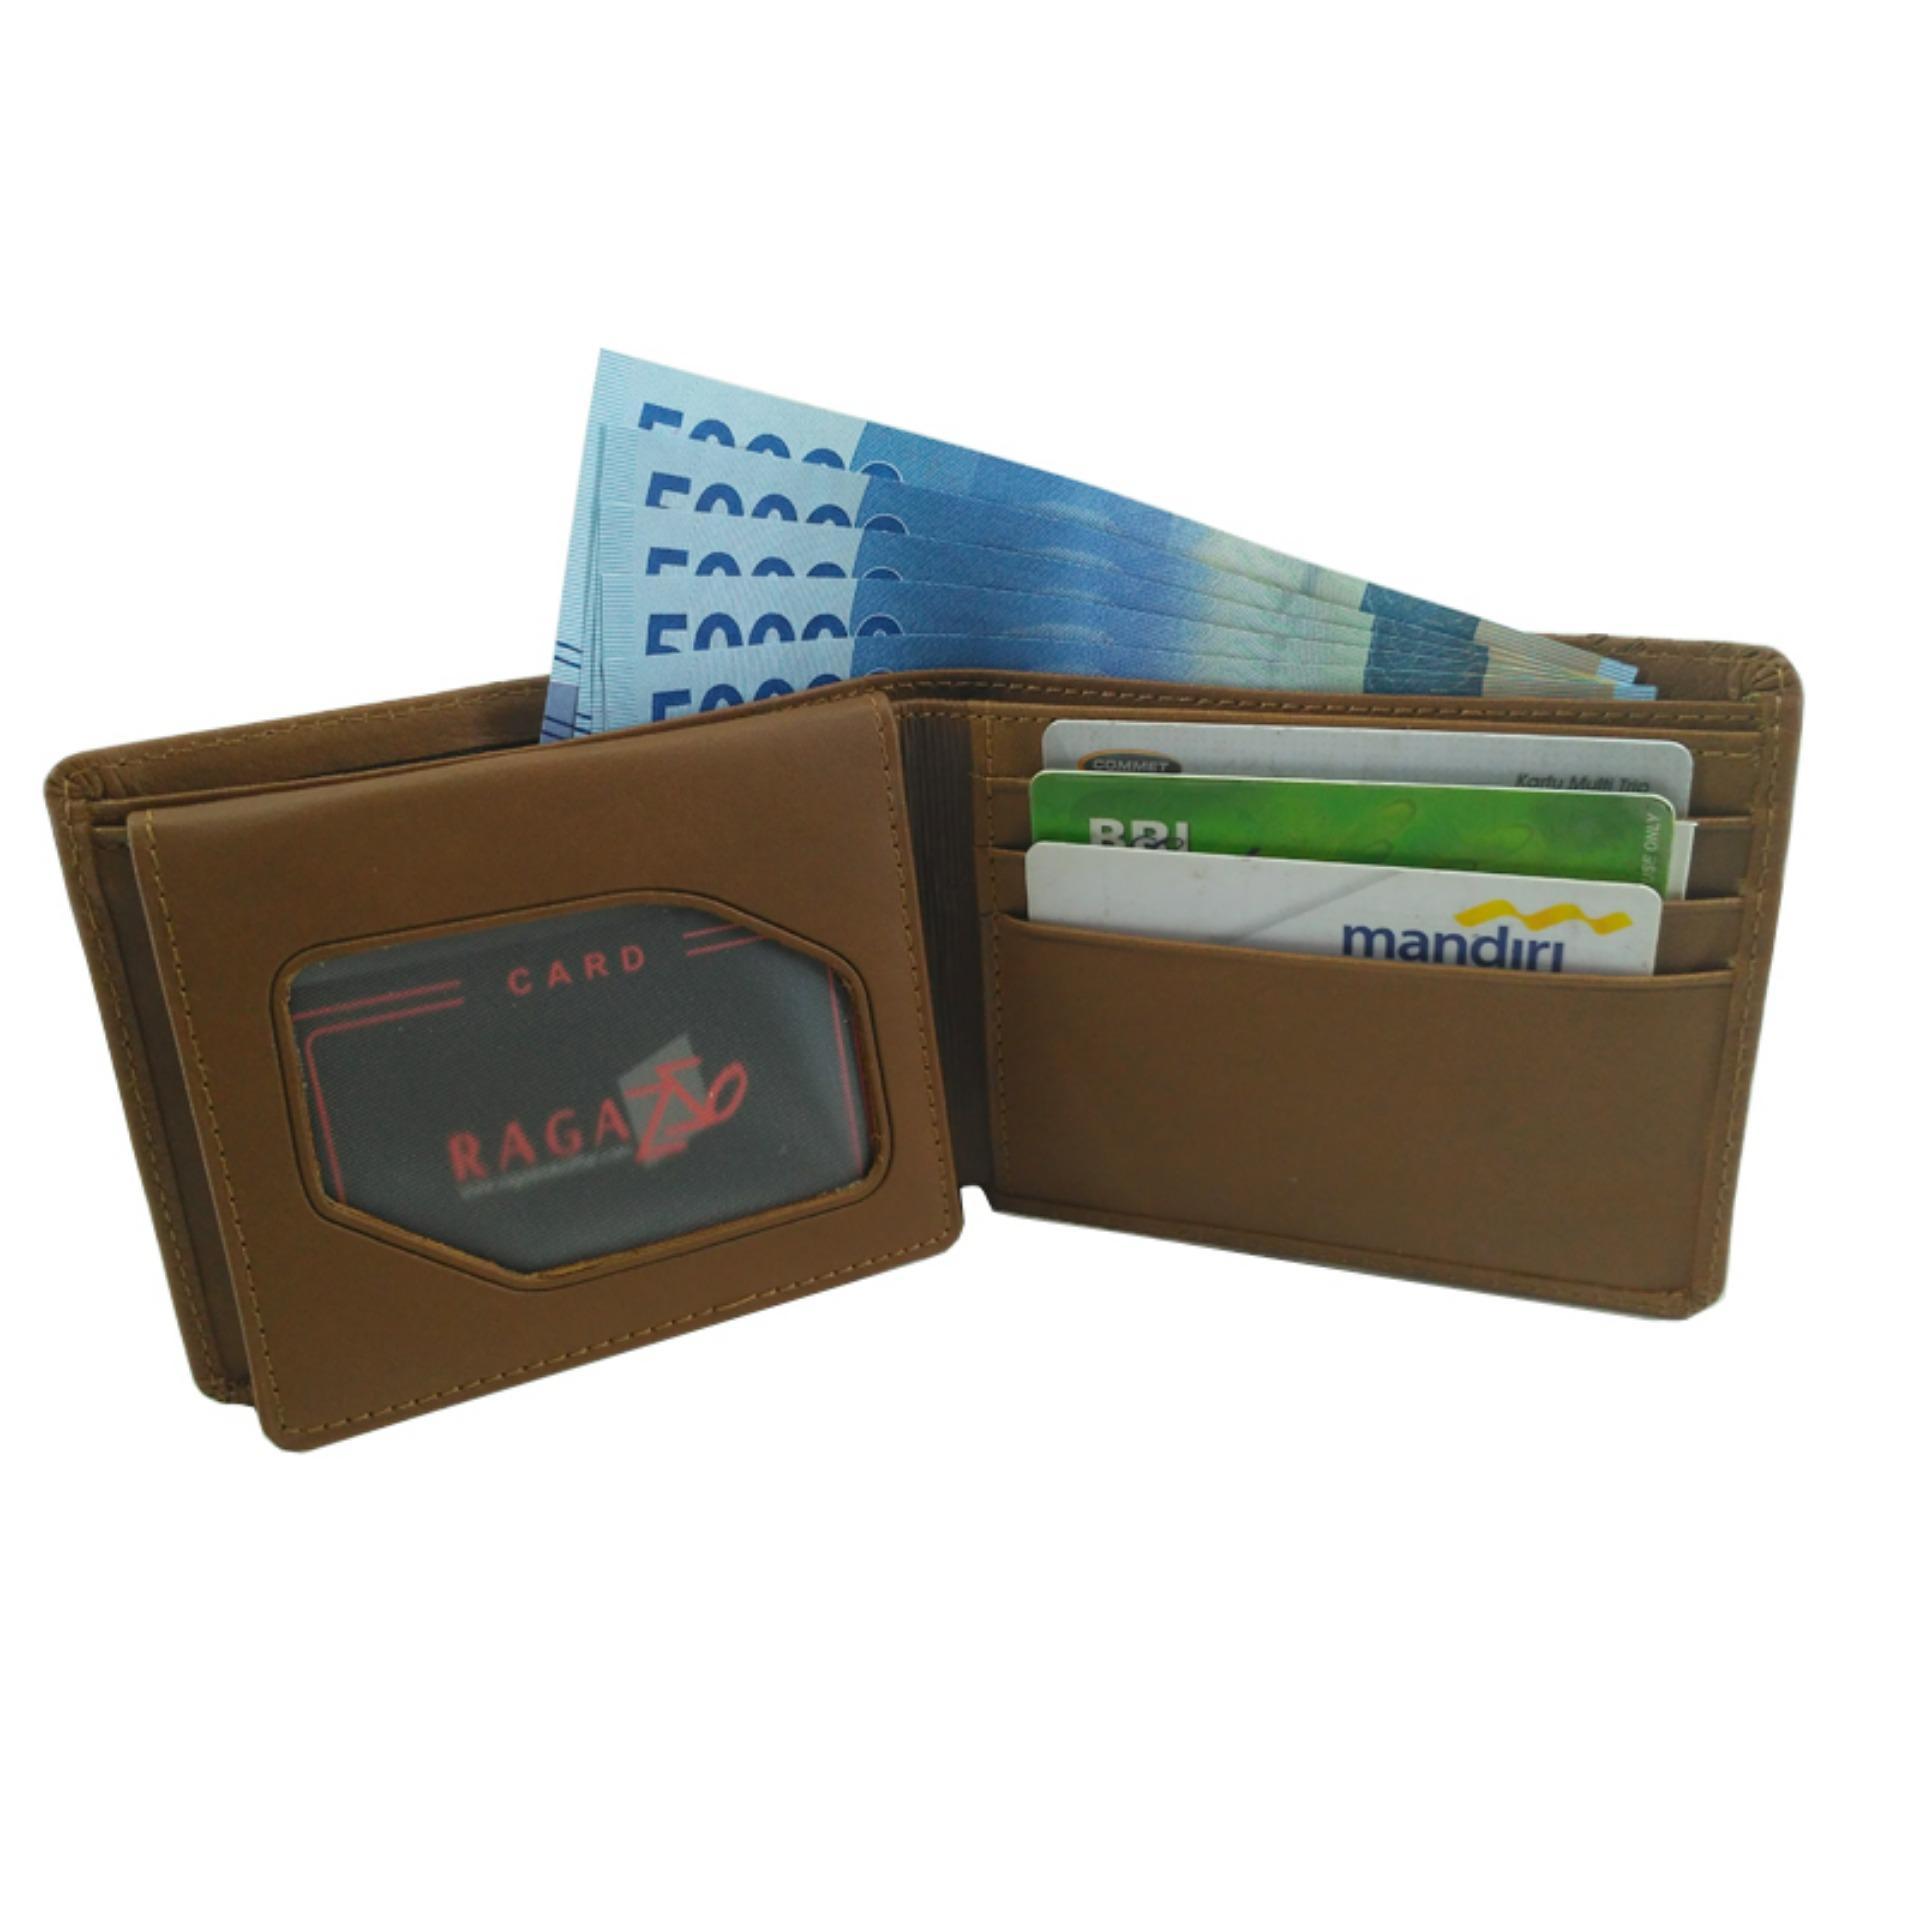 Dompet Pria Kulit Asli Bifold Wallet Mens Import Branded Murah Terbaru Ragazzo Light Brown DKR-